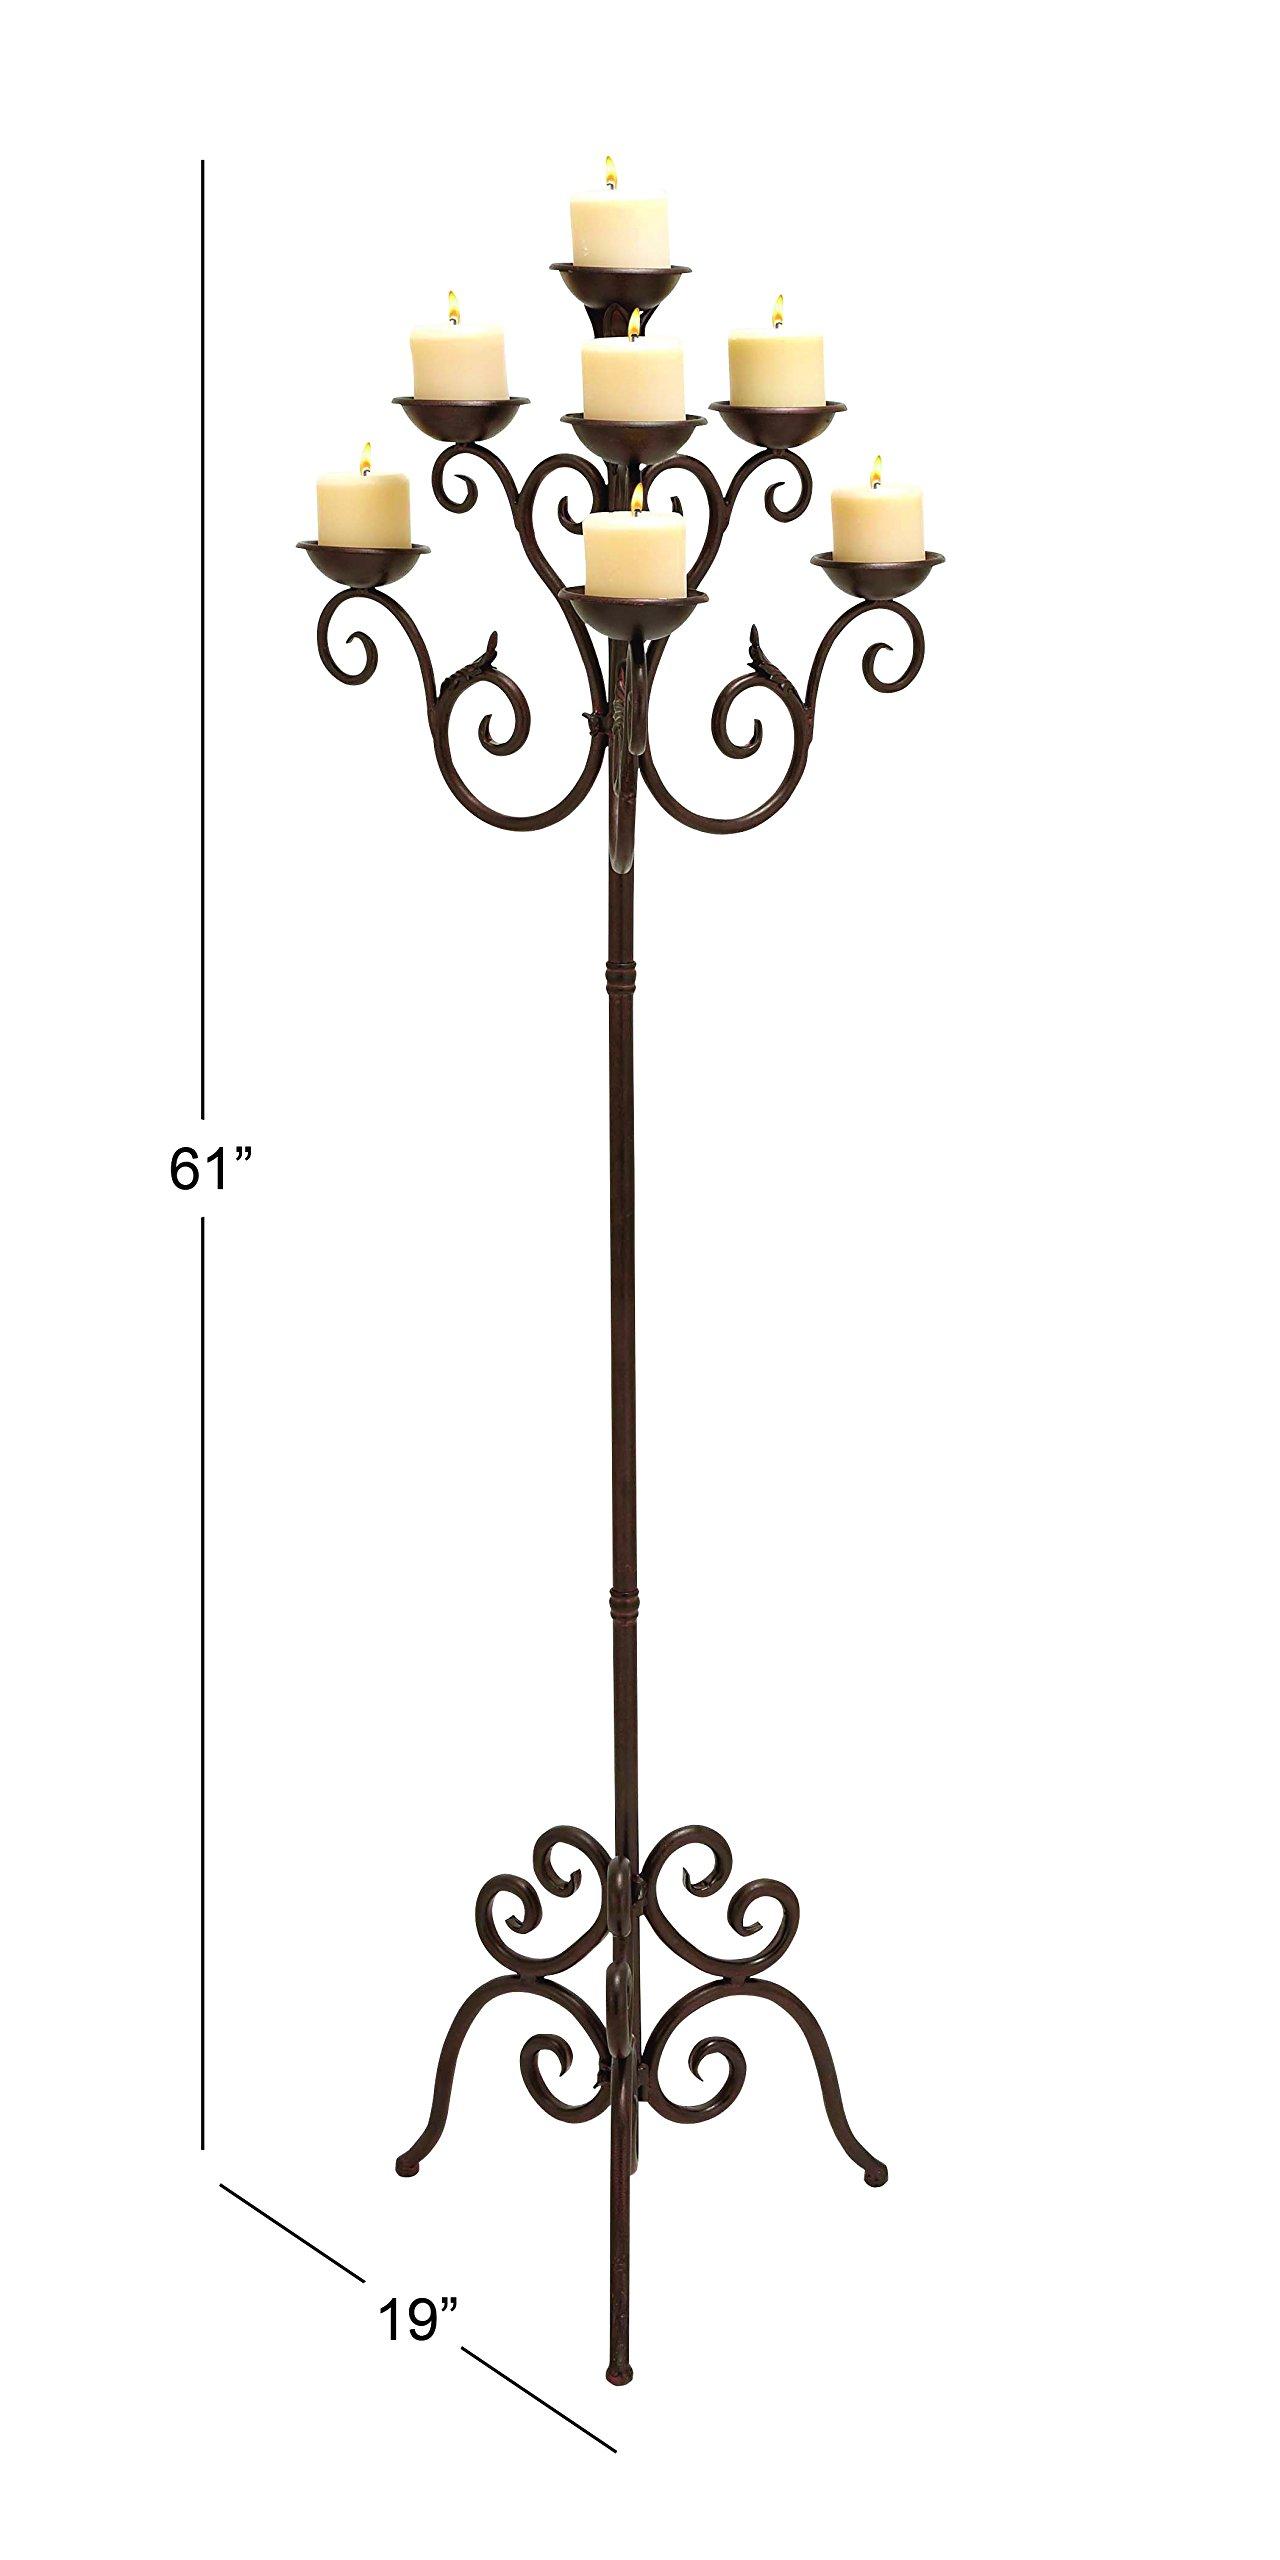 Deco 79 50237 Metal Candelabra, 19'' x 61'' by Deco 79